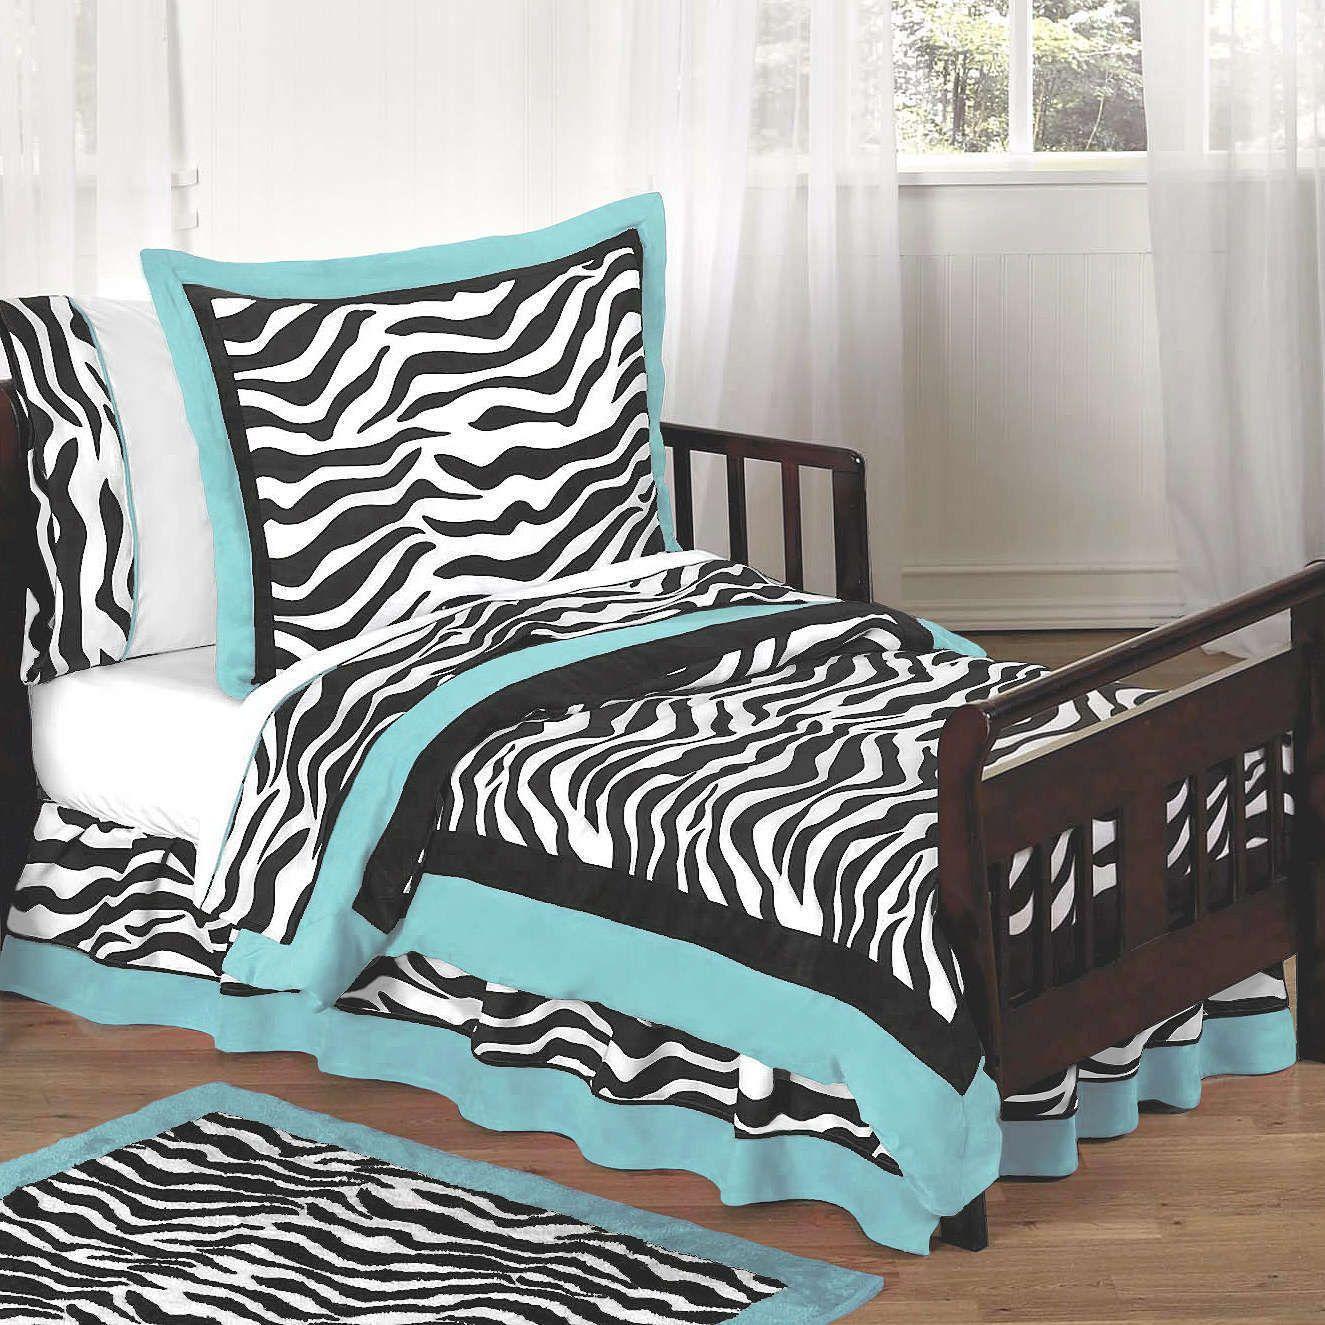 Black and white bedroom ideas bedroomdesignturquoiseblackand